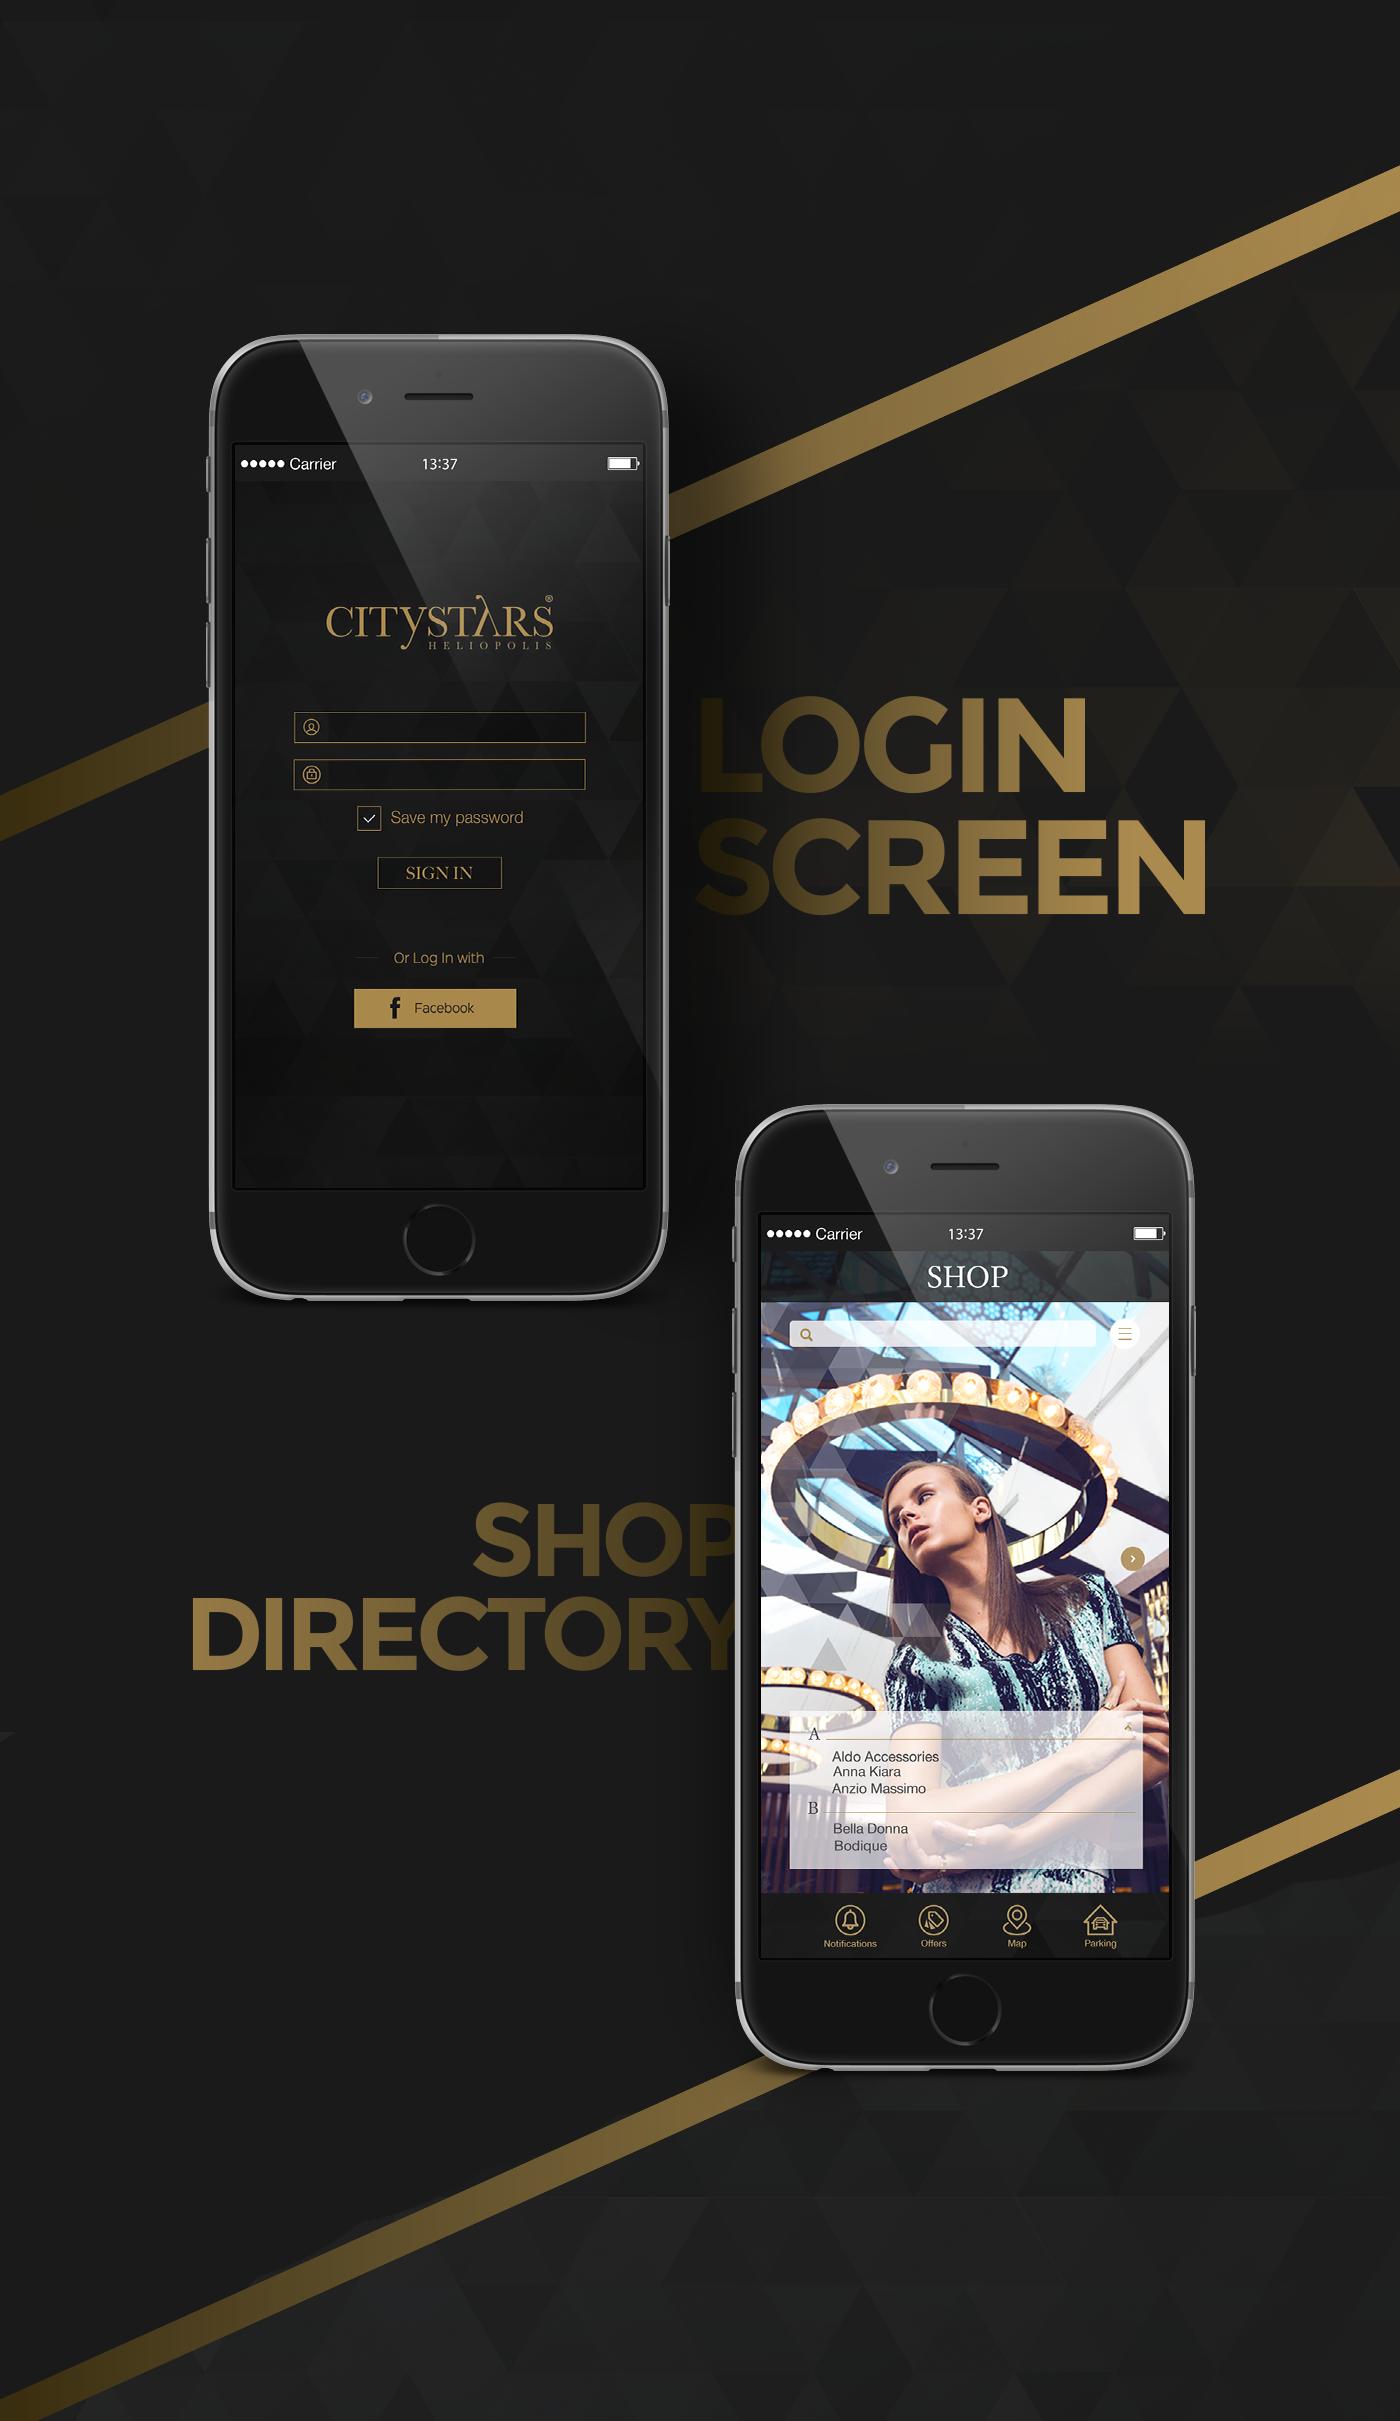 mobile application UI ux Interface citystars egypt cairo Brandinc brandinc. mall app store zara